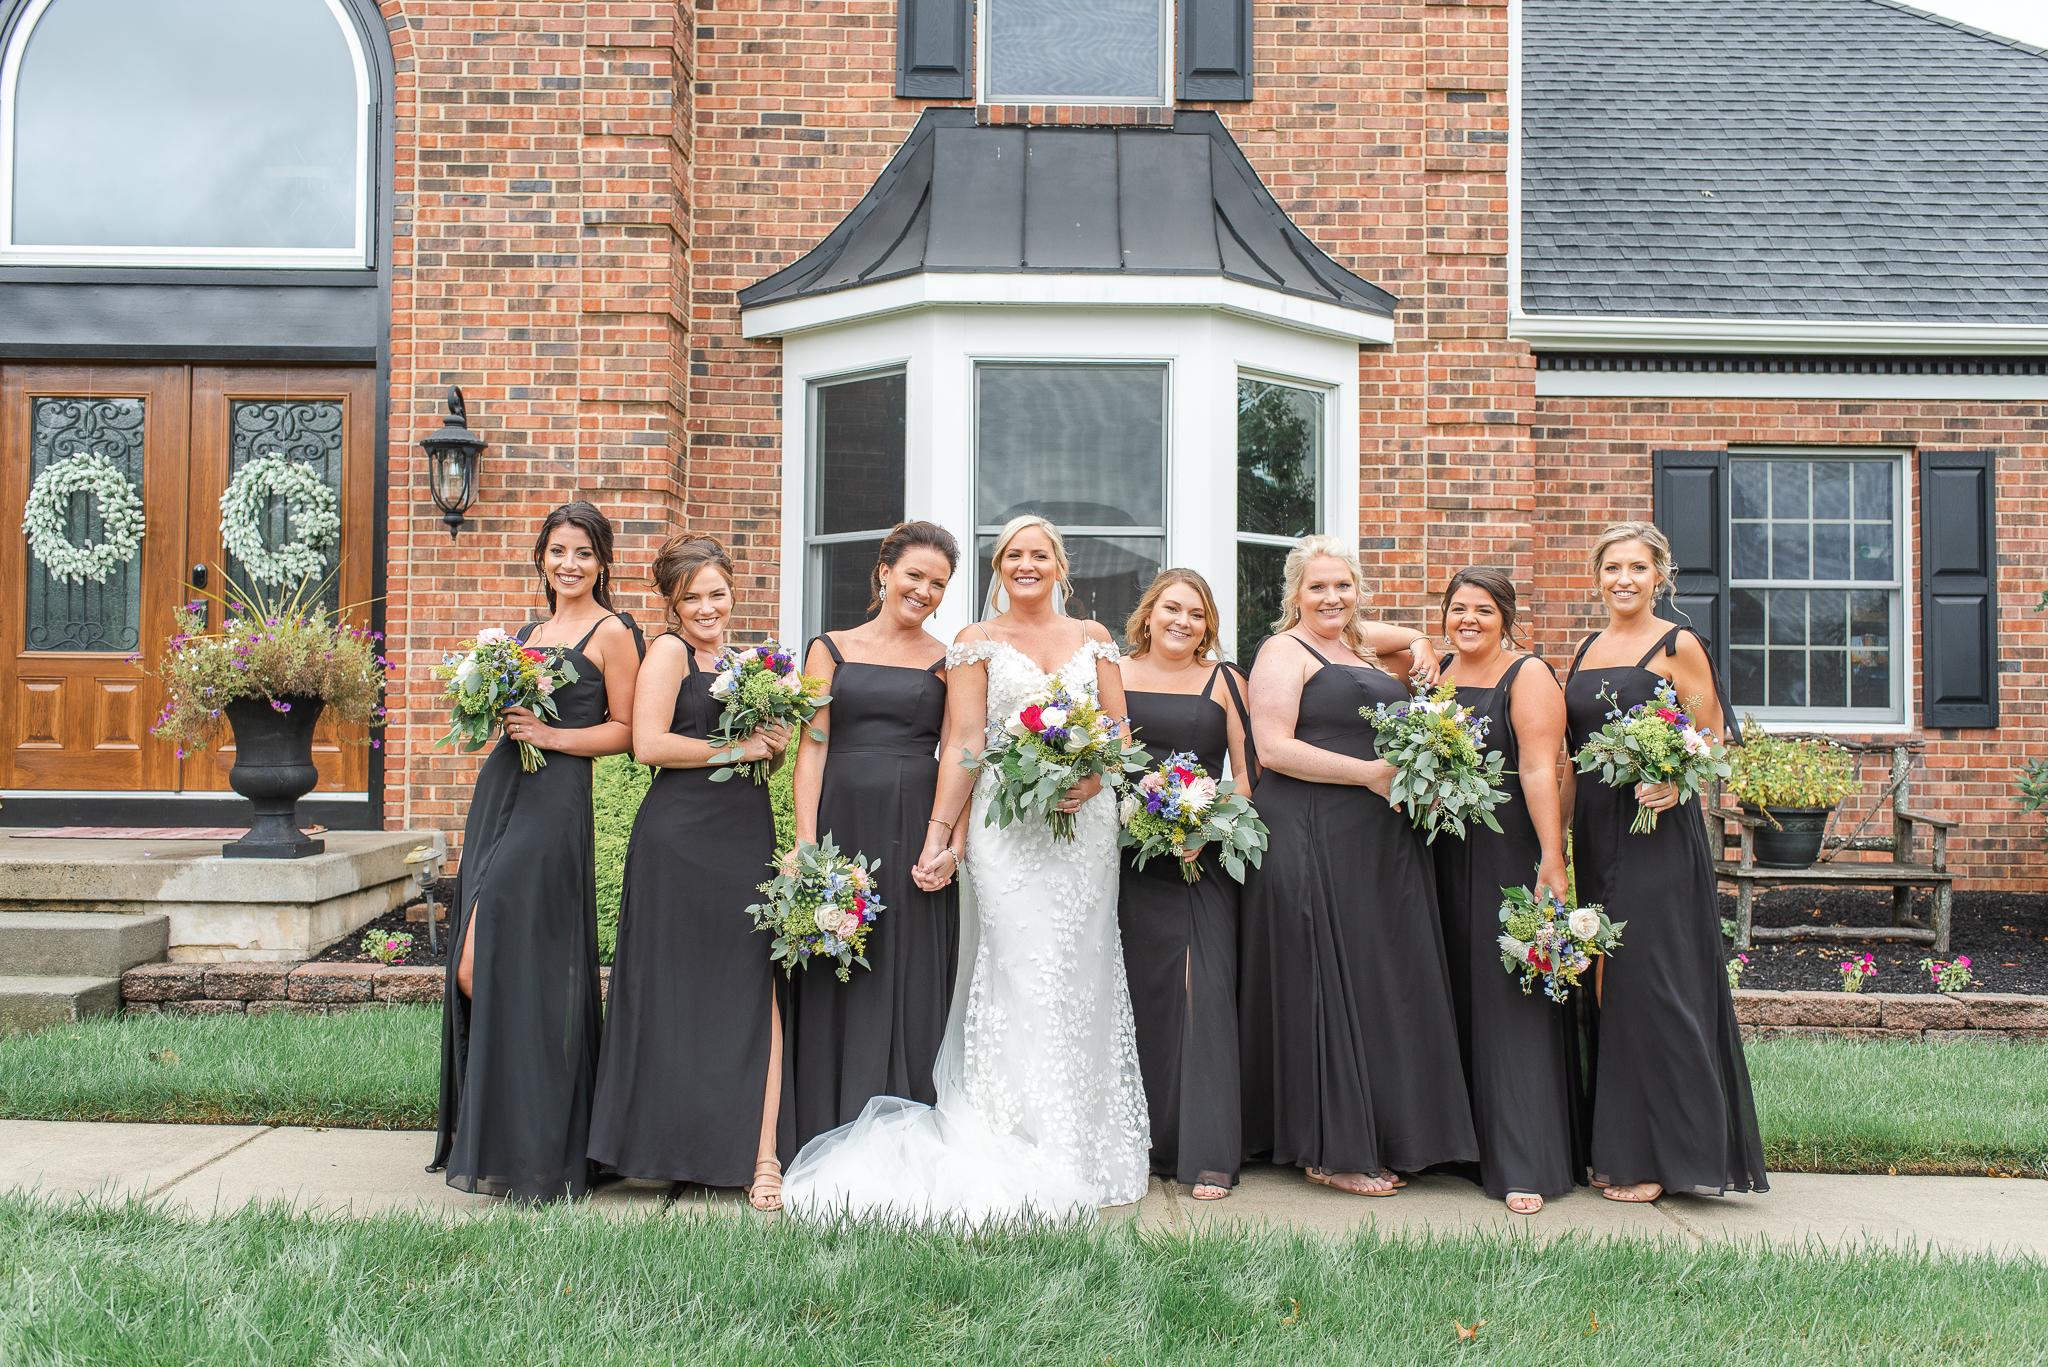 09_06_2019_Dana_Slifer_Photography_Casey_and_Adam_Wedding_05.jpg